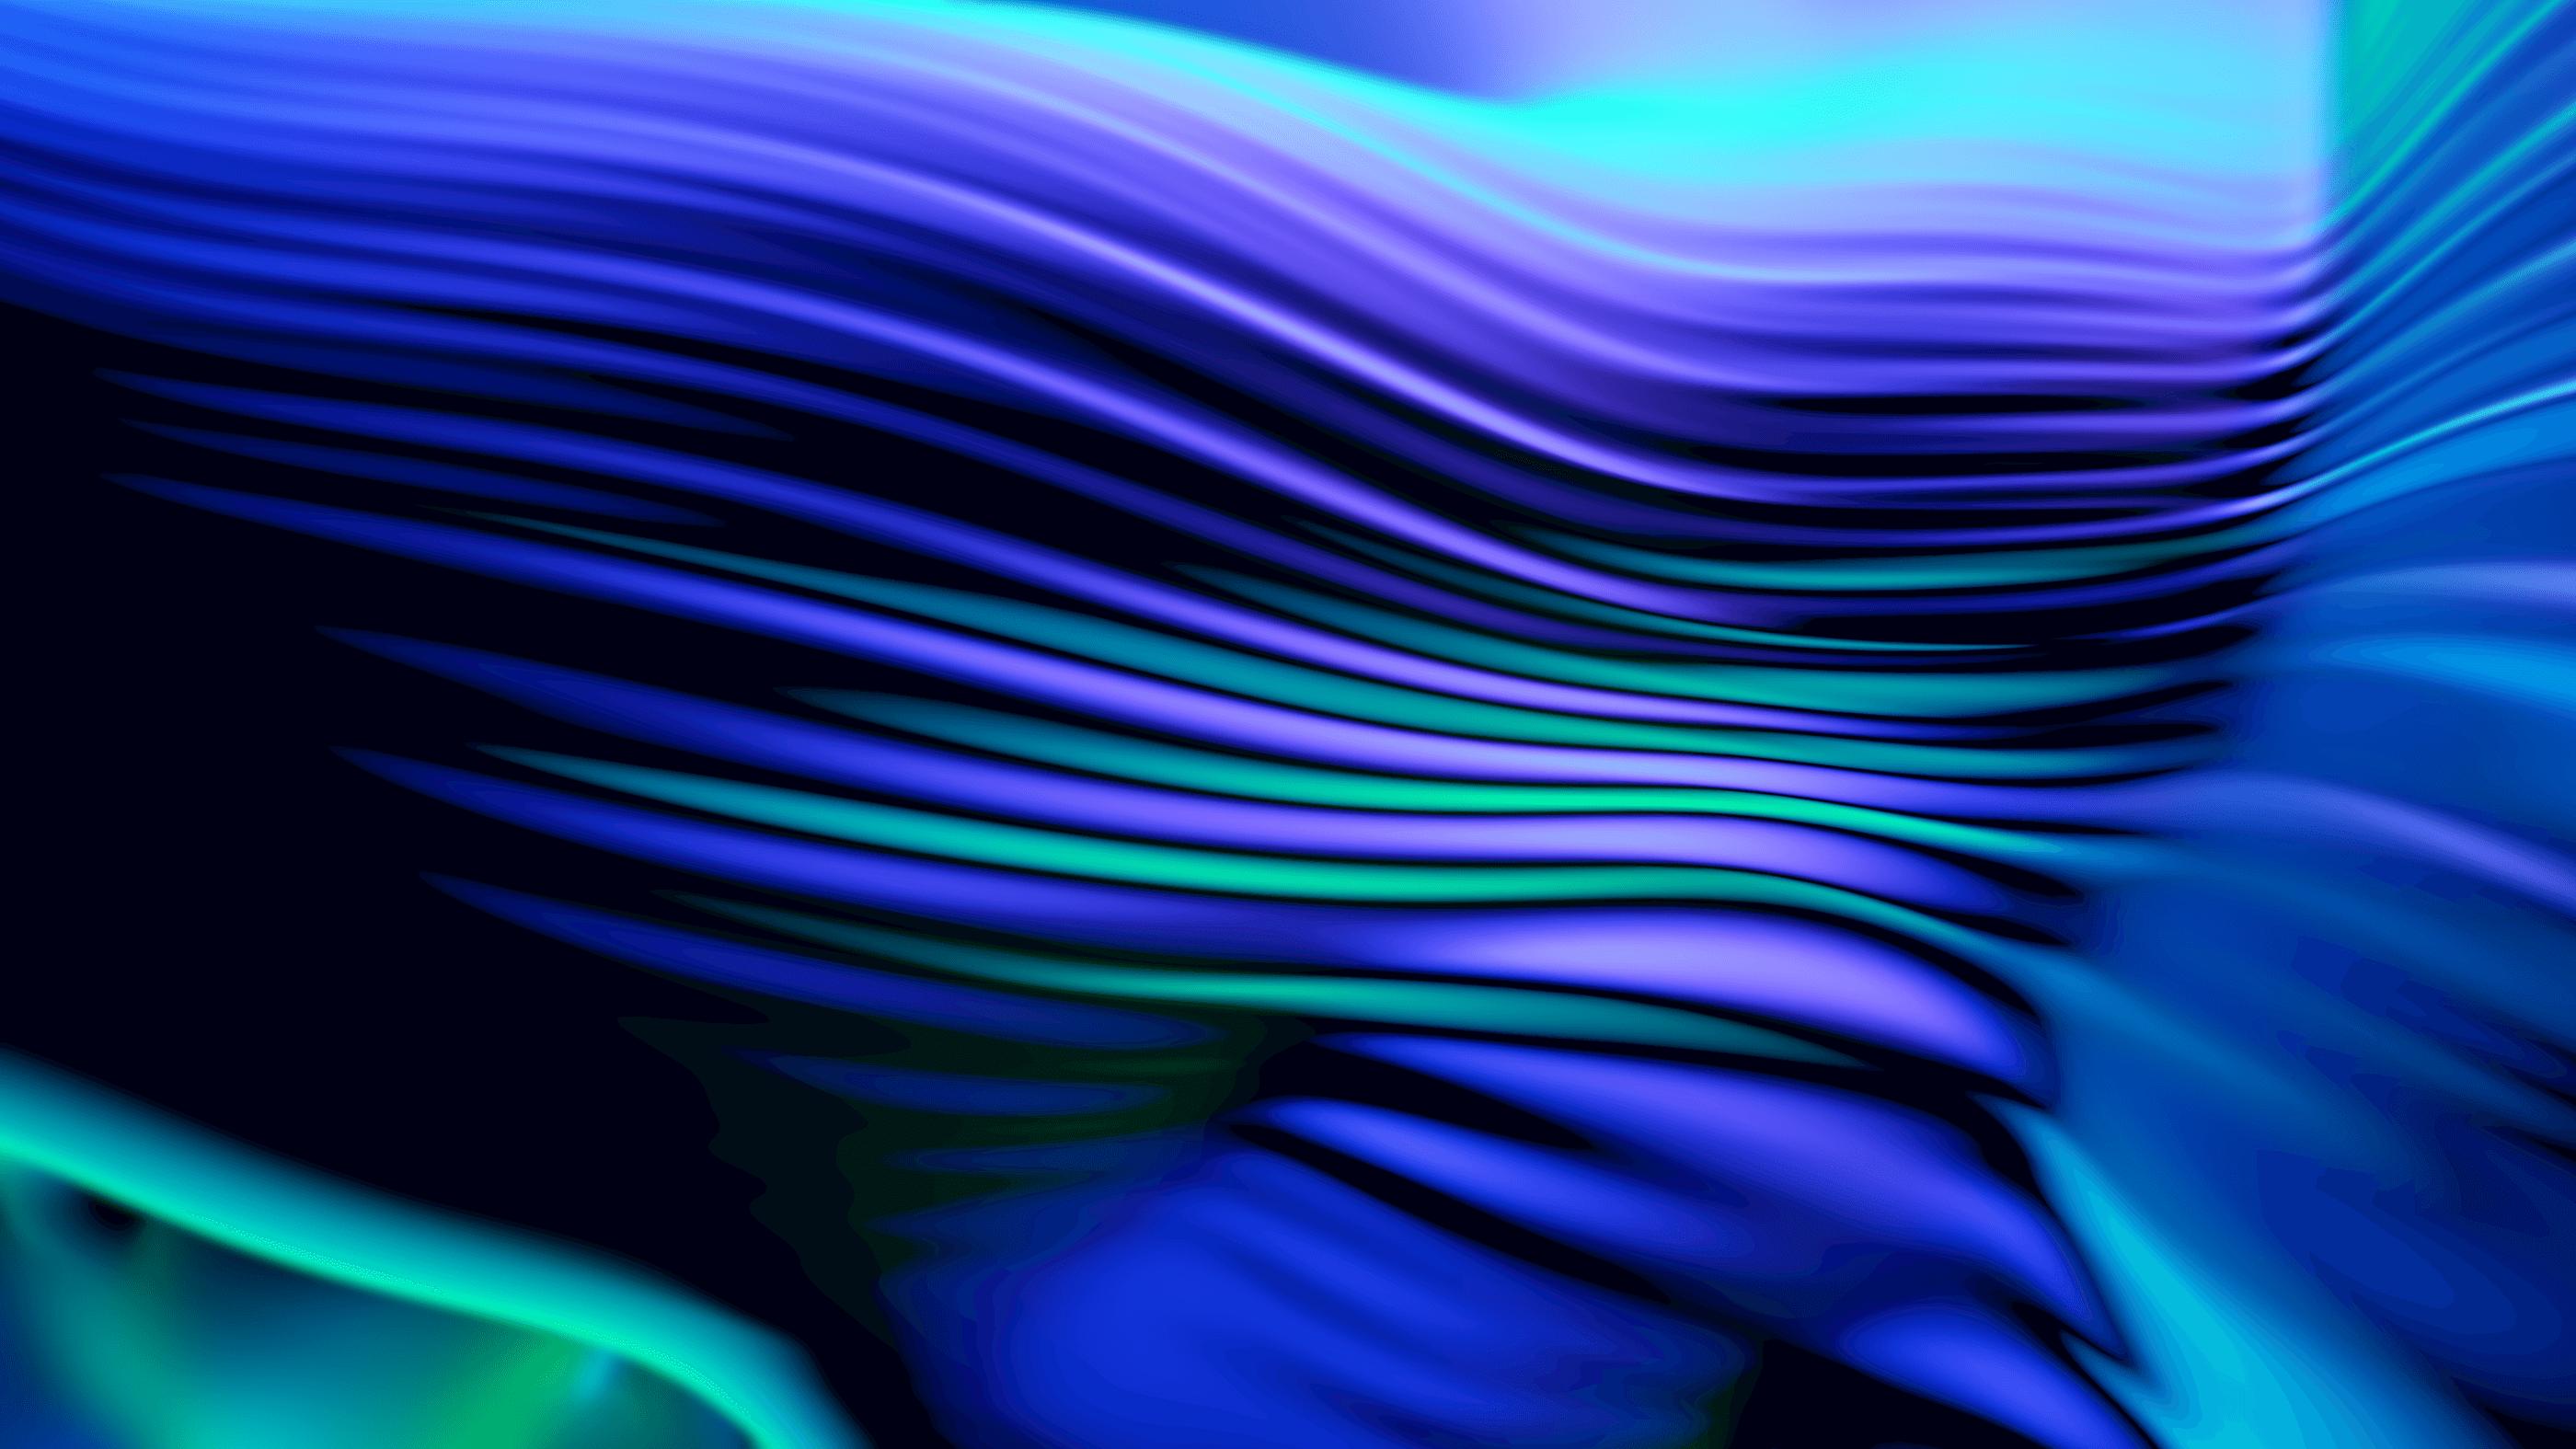 BlueTurquoise 3